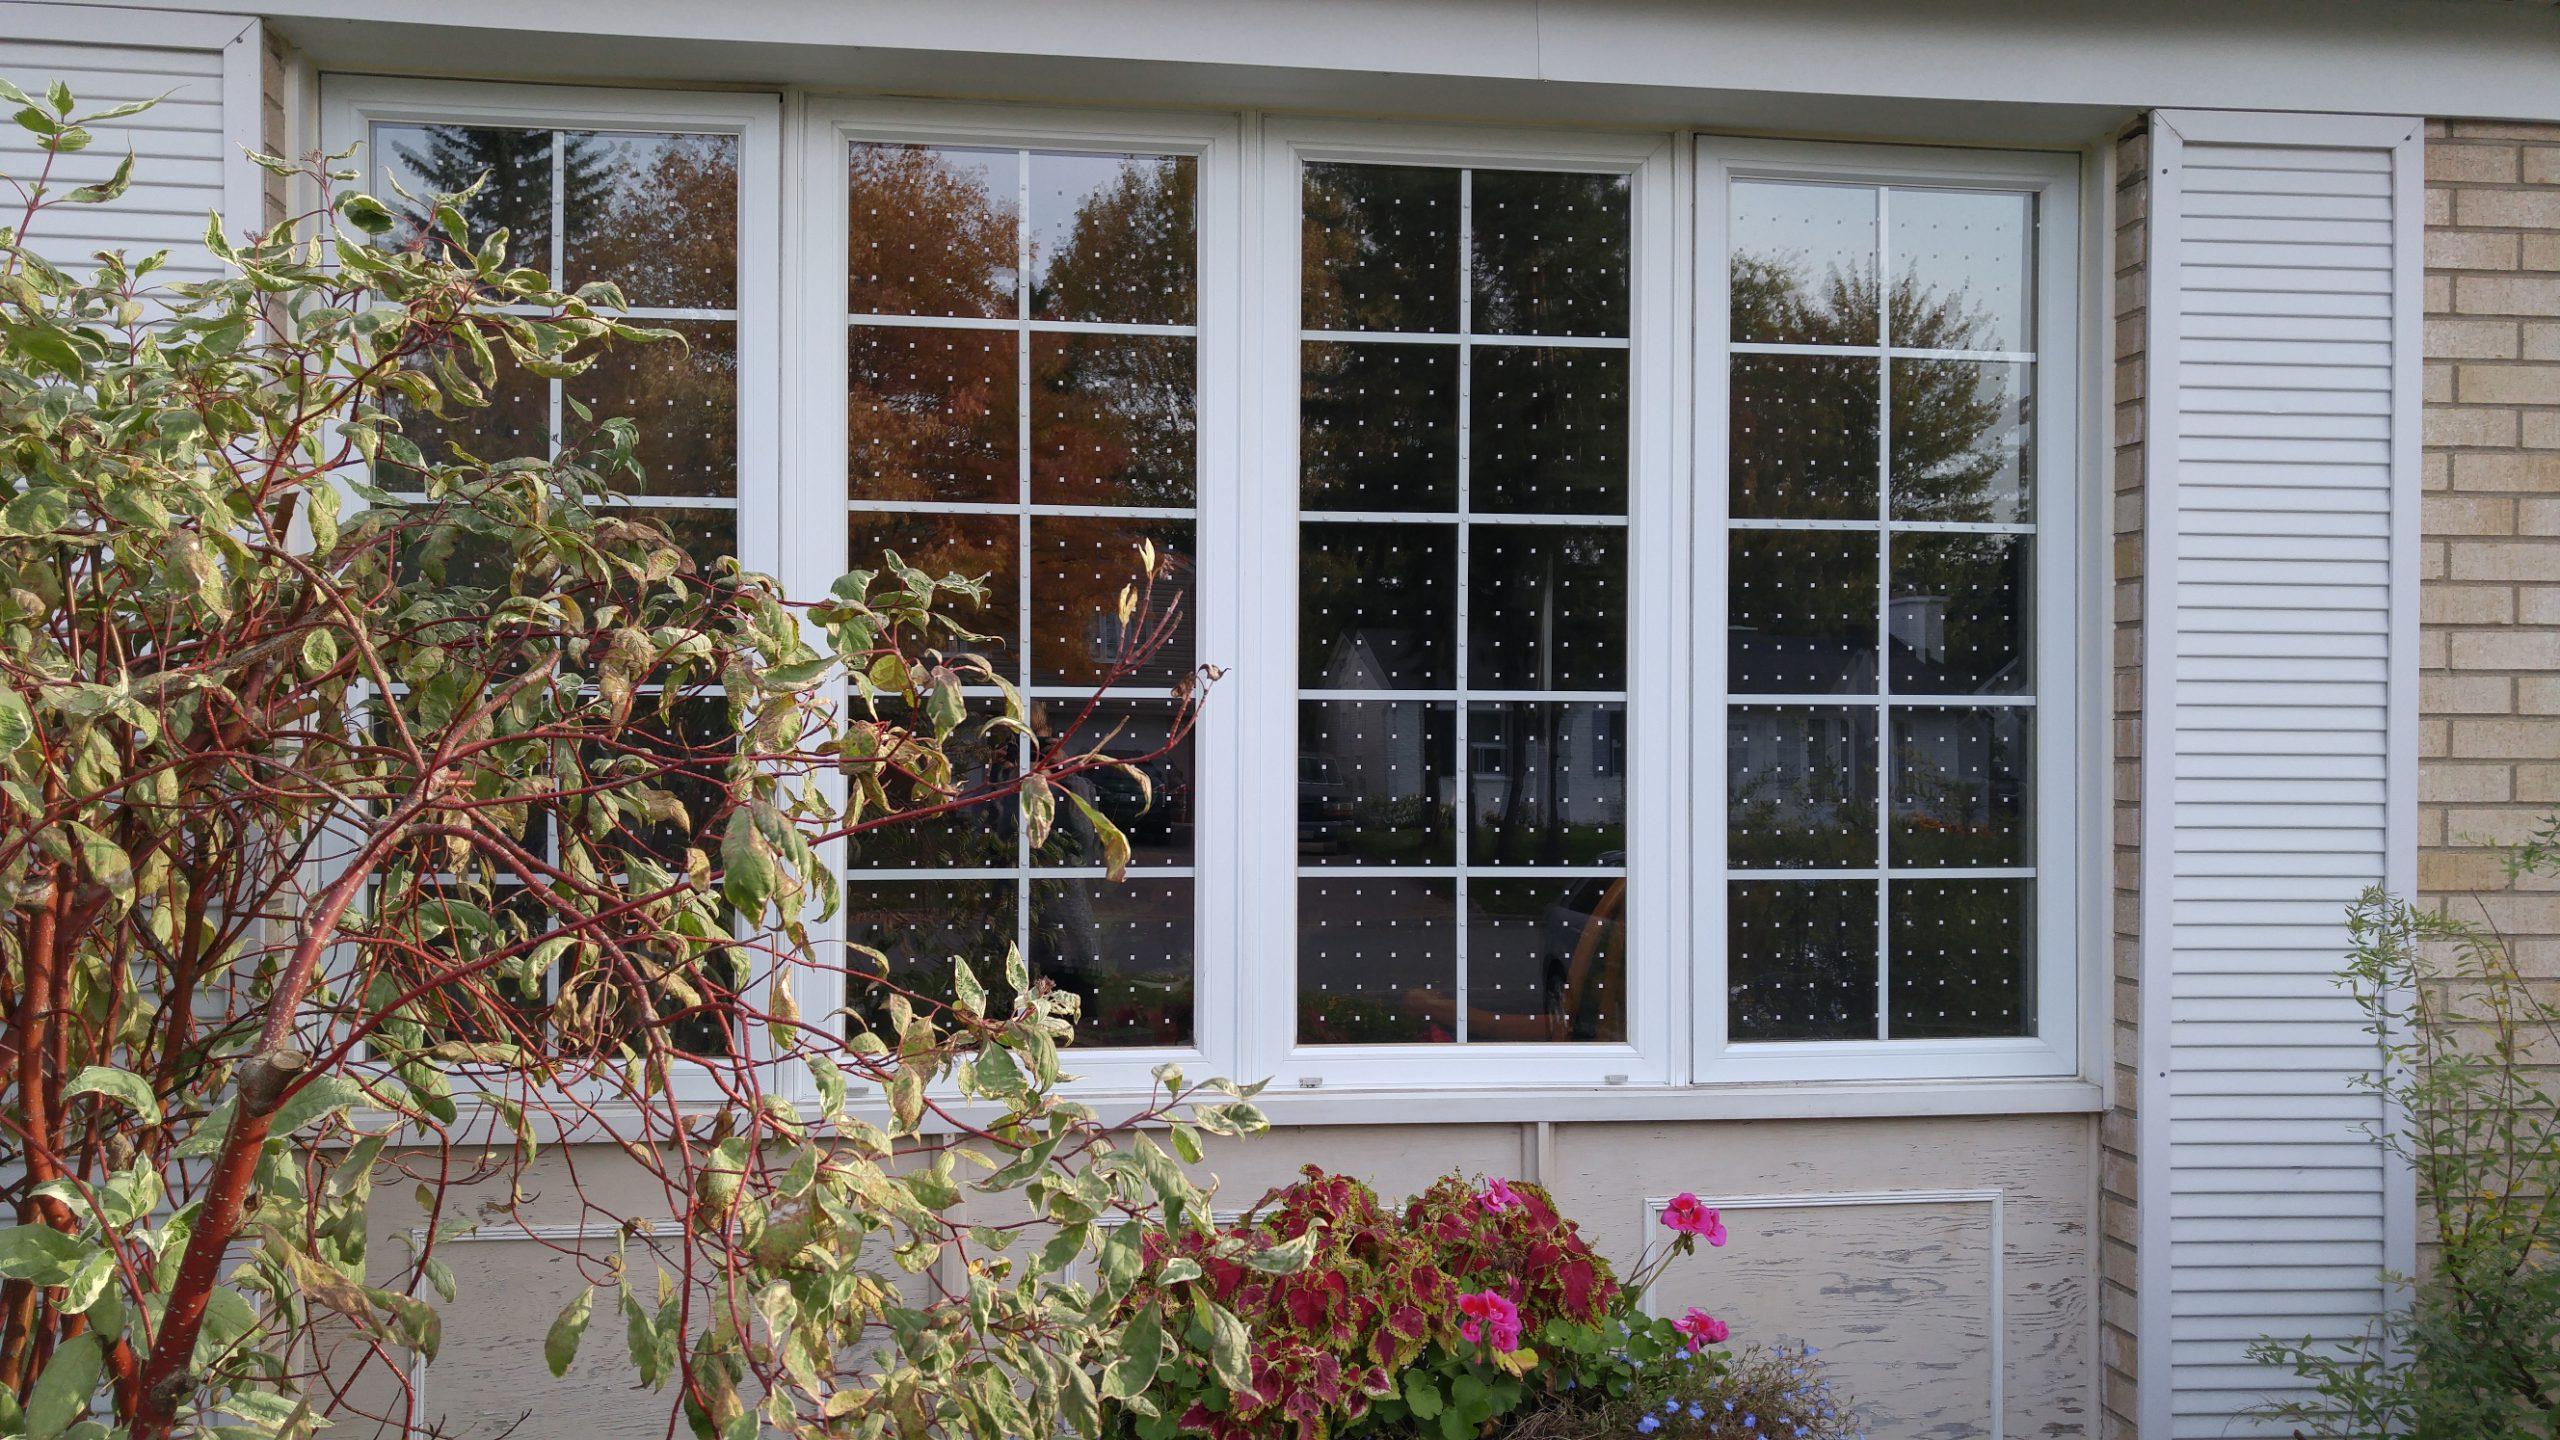 A window with bird collision deterrent tape installed.